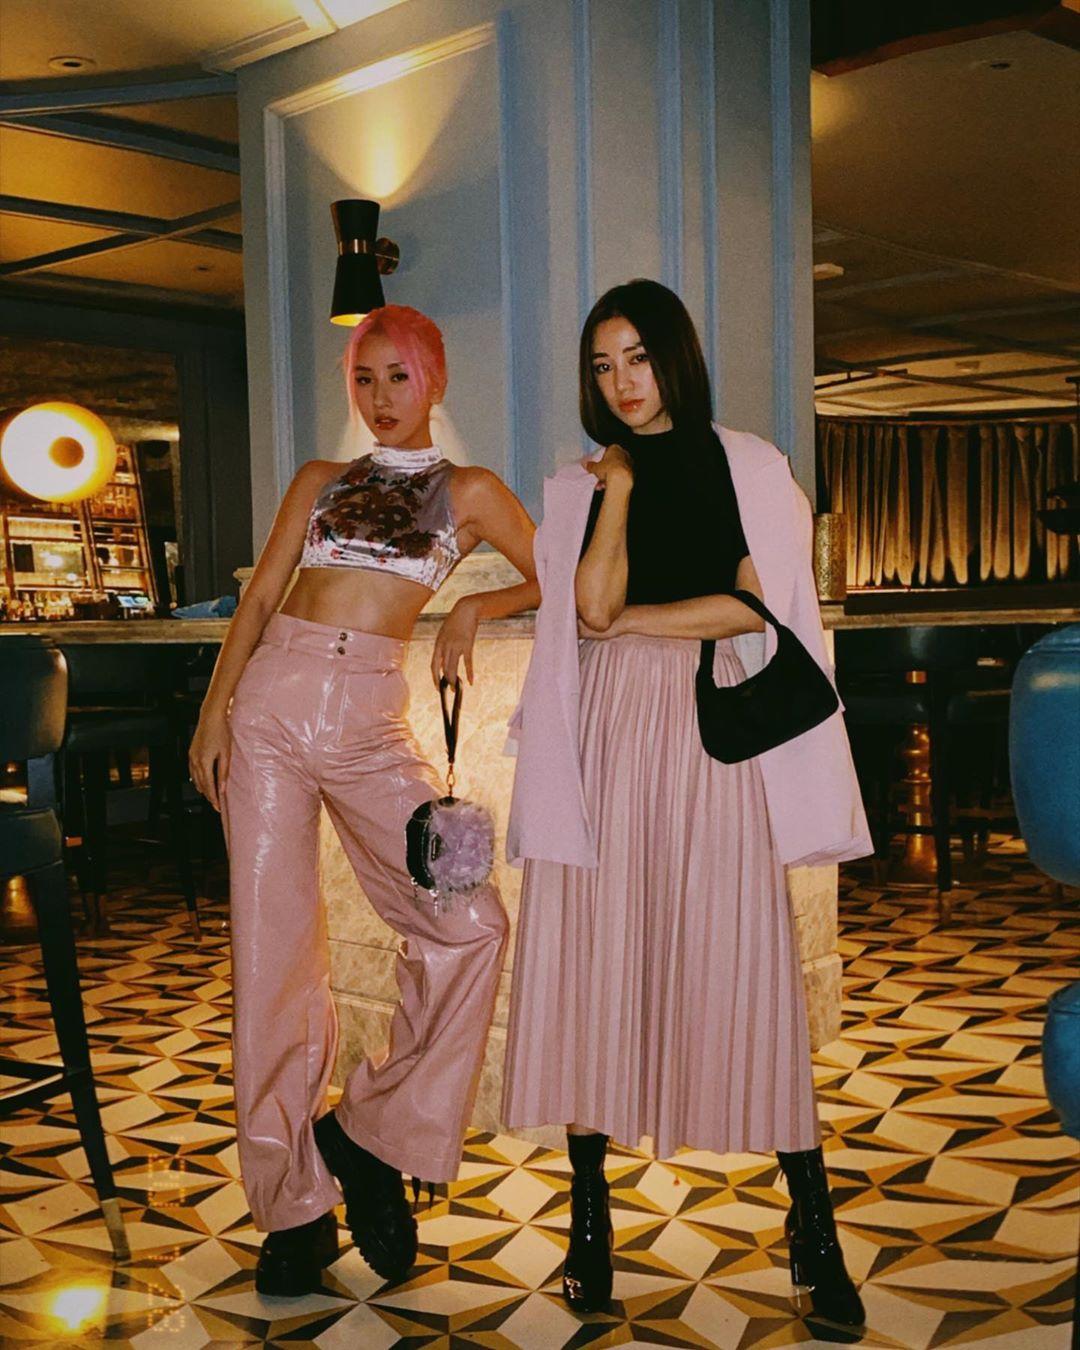 váy xếp ly màu hồng áo blazer áo thun đen salim